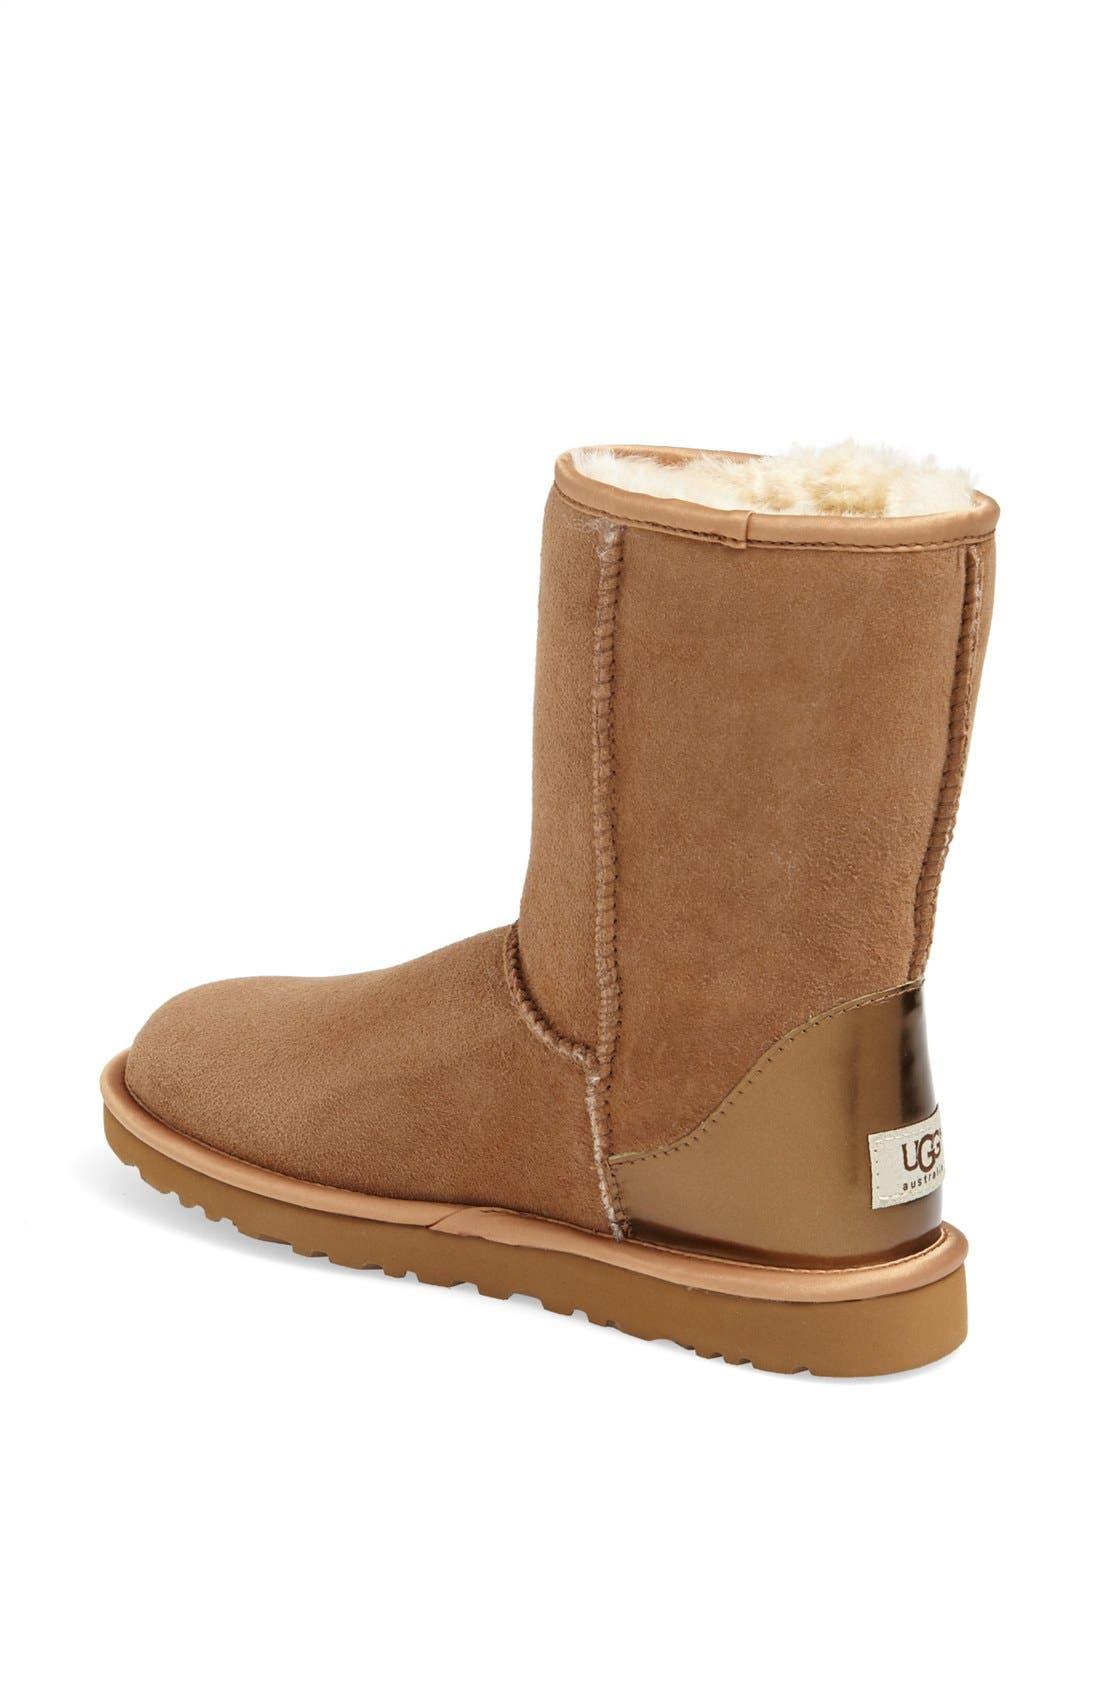 Alternate Image 2  - UGG® Australia 'Classic Short' Metallic Patent Boot (Women)